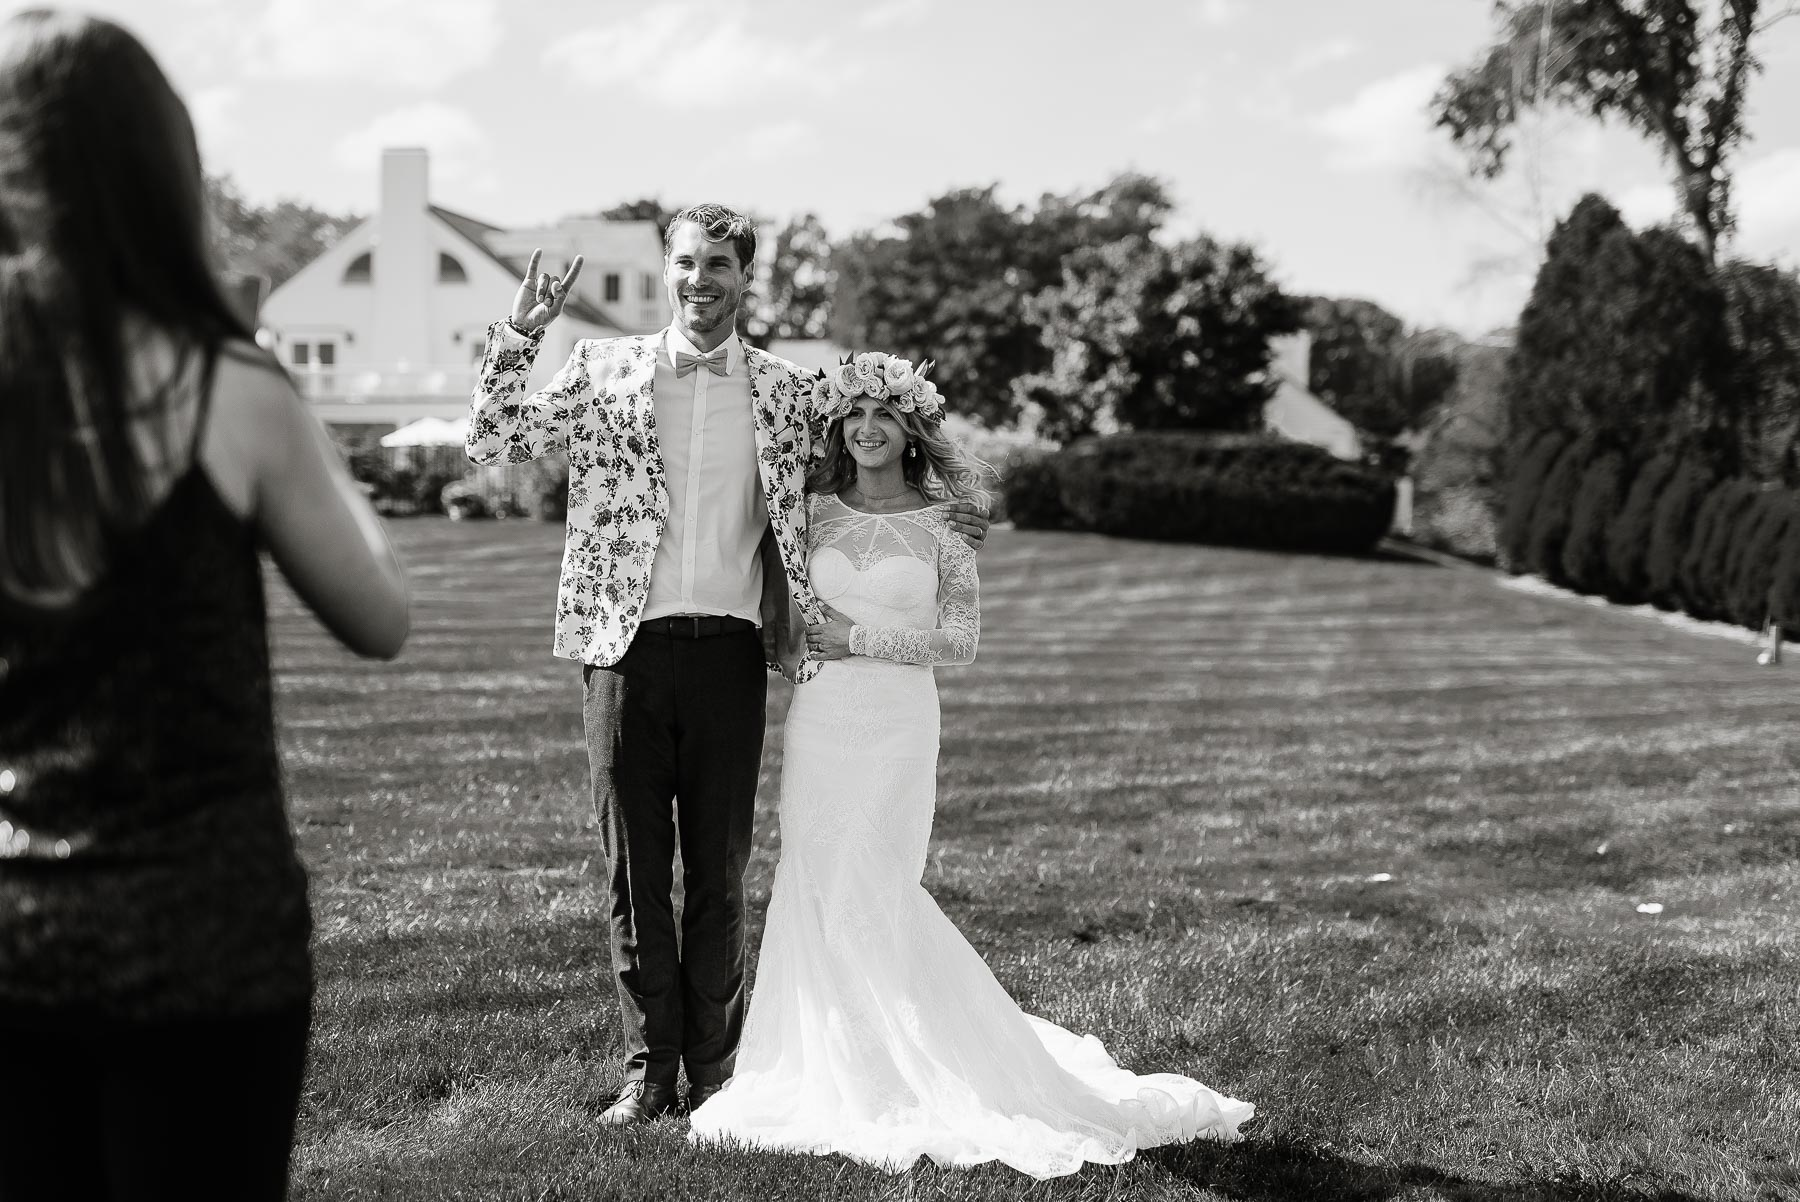 76-Bohemian New Hampshire Beach Wedding Rye New Hampshire Weddings Summer Sessions Surf Shop Longbrook Photography.jpg